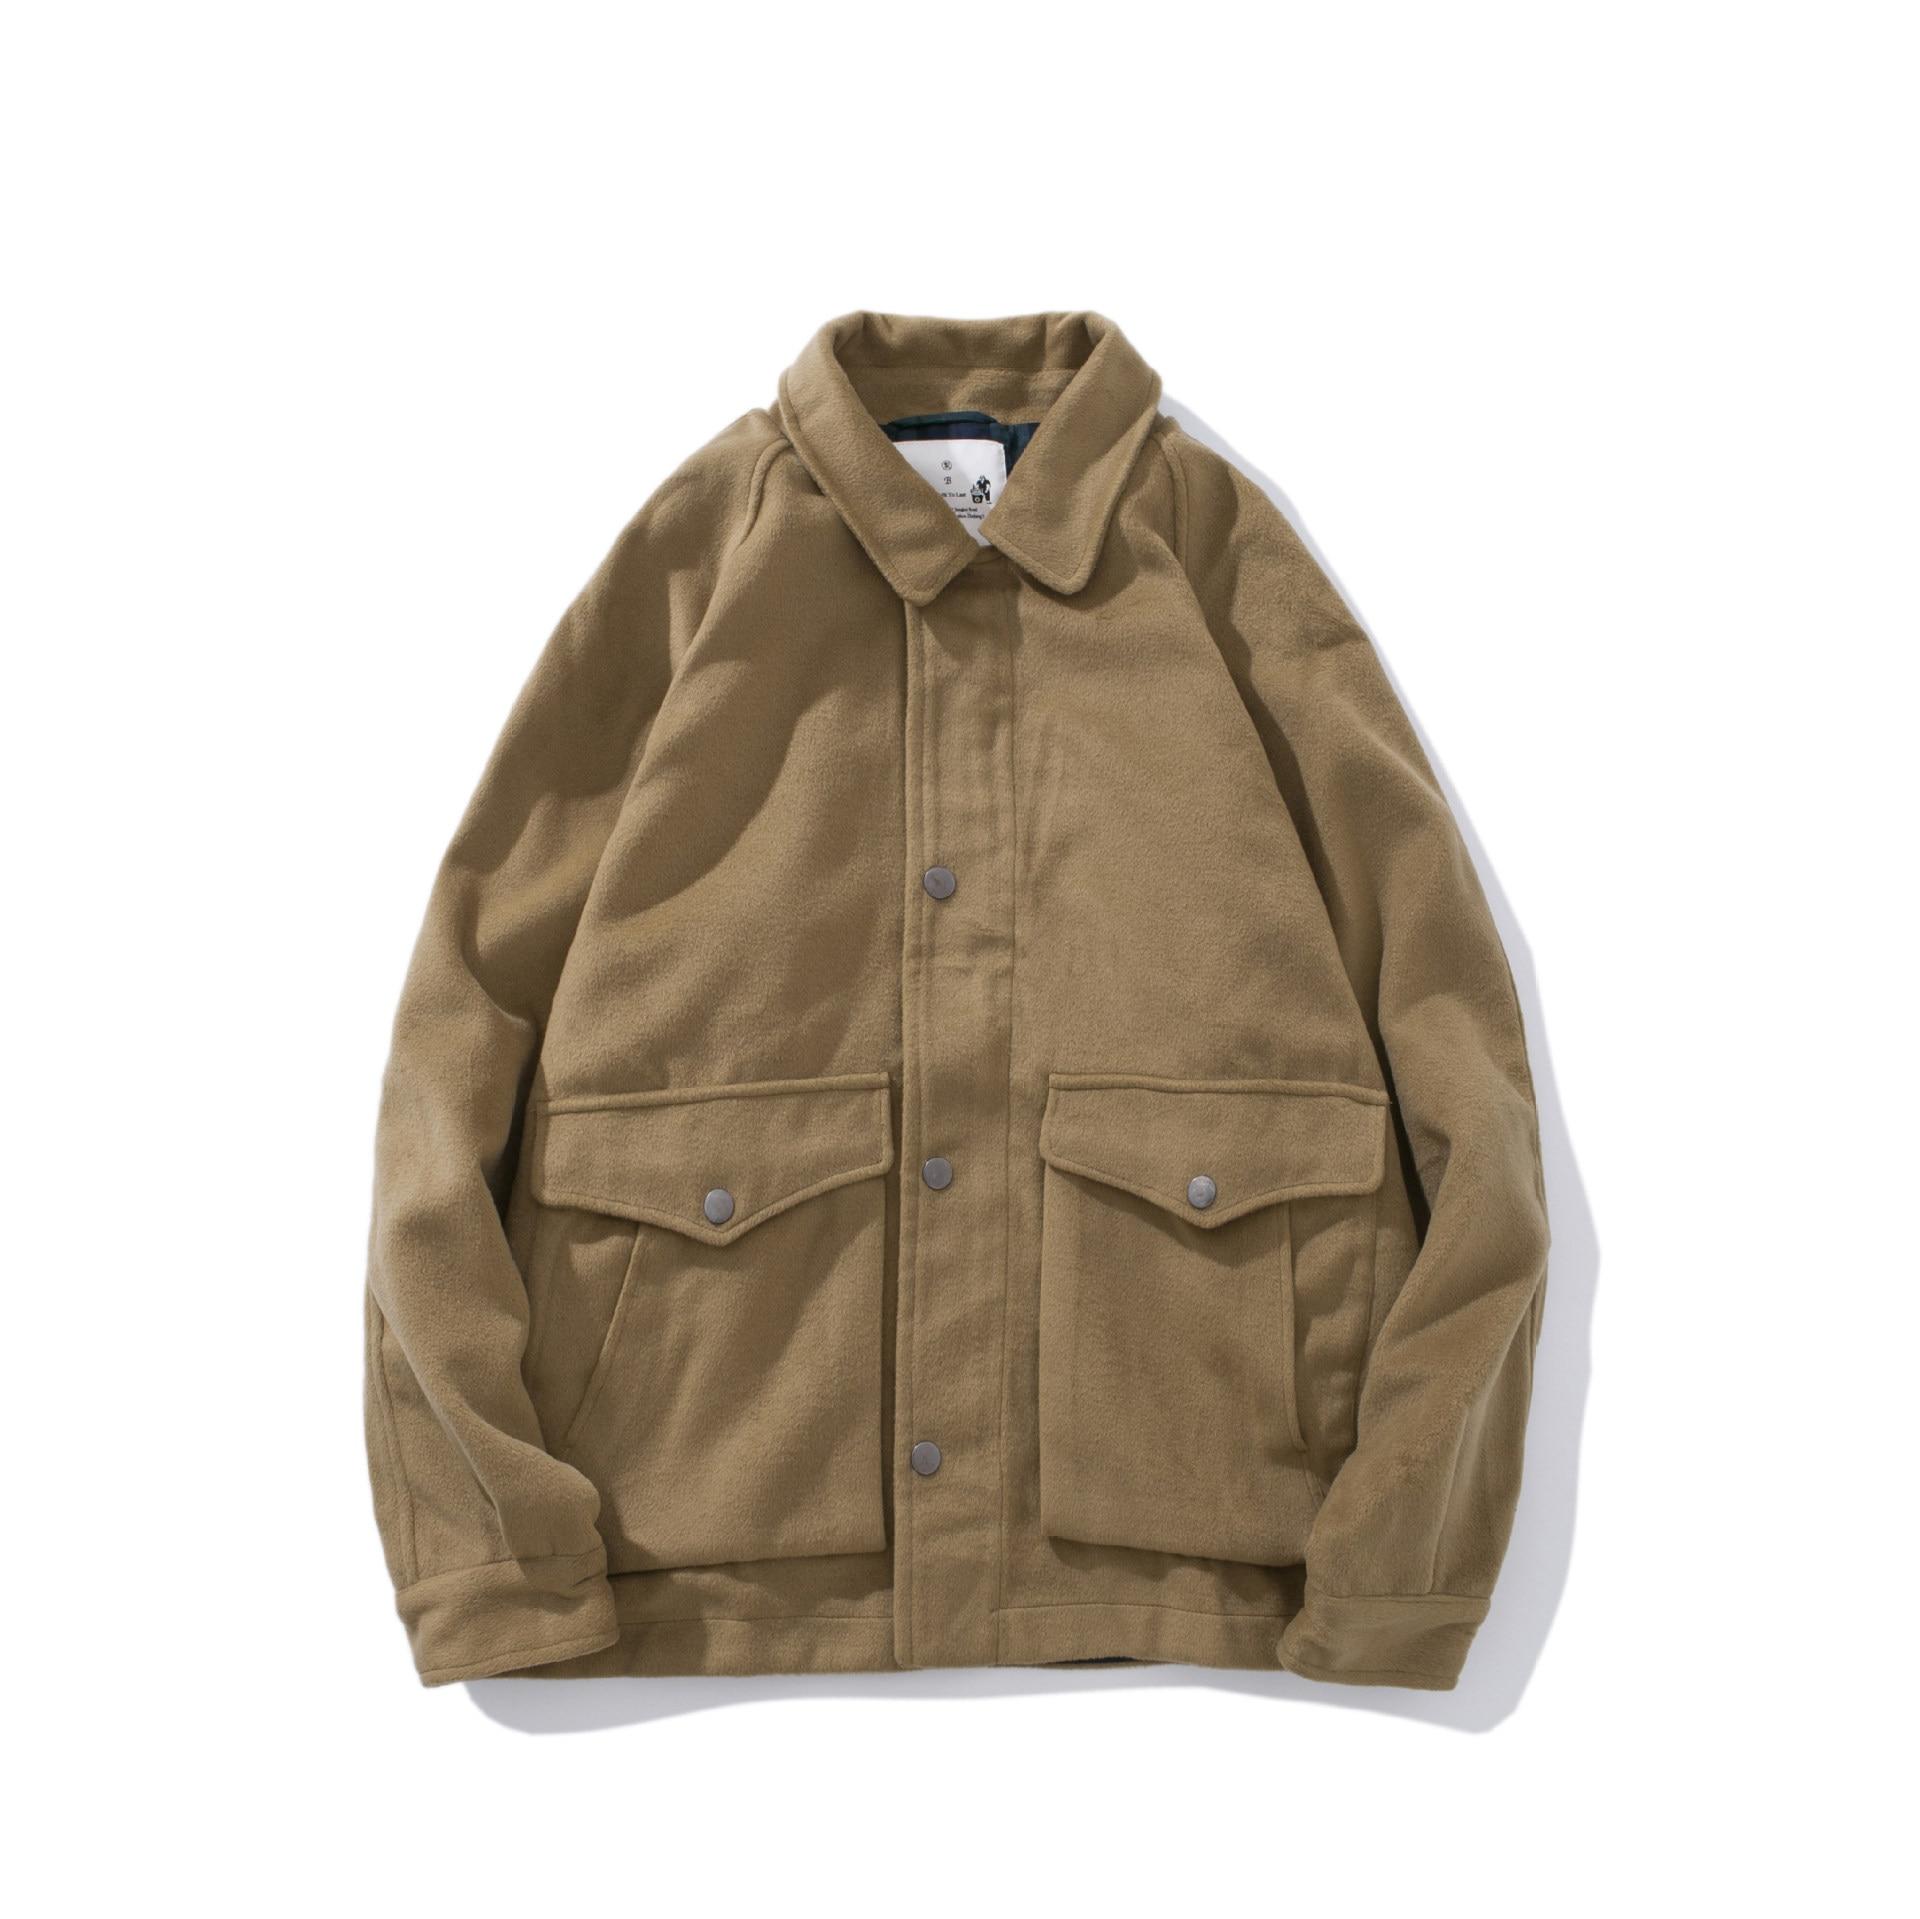 Khaki Button Down Men Cargo Jacket Double Pocket Western Vintage Work Turn Down Collar Chore Coat Japanese Harajuku